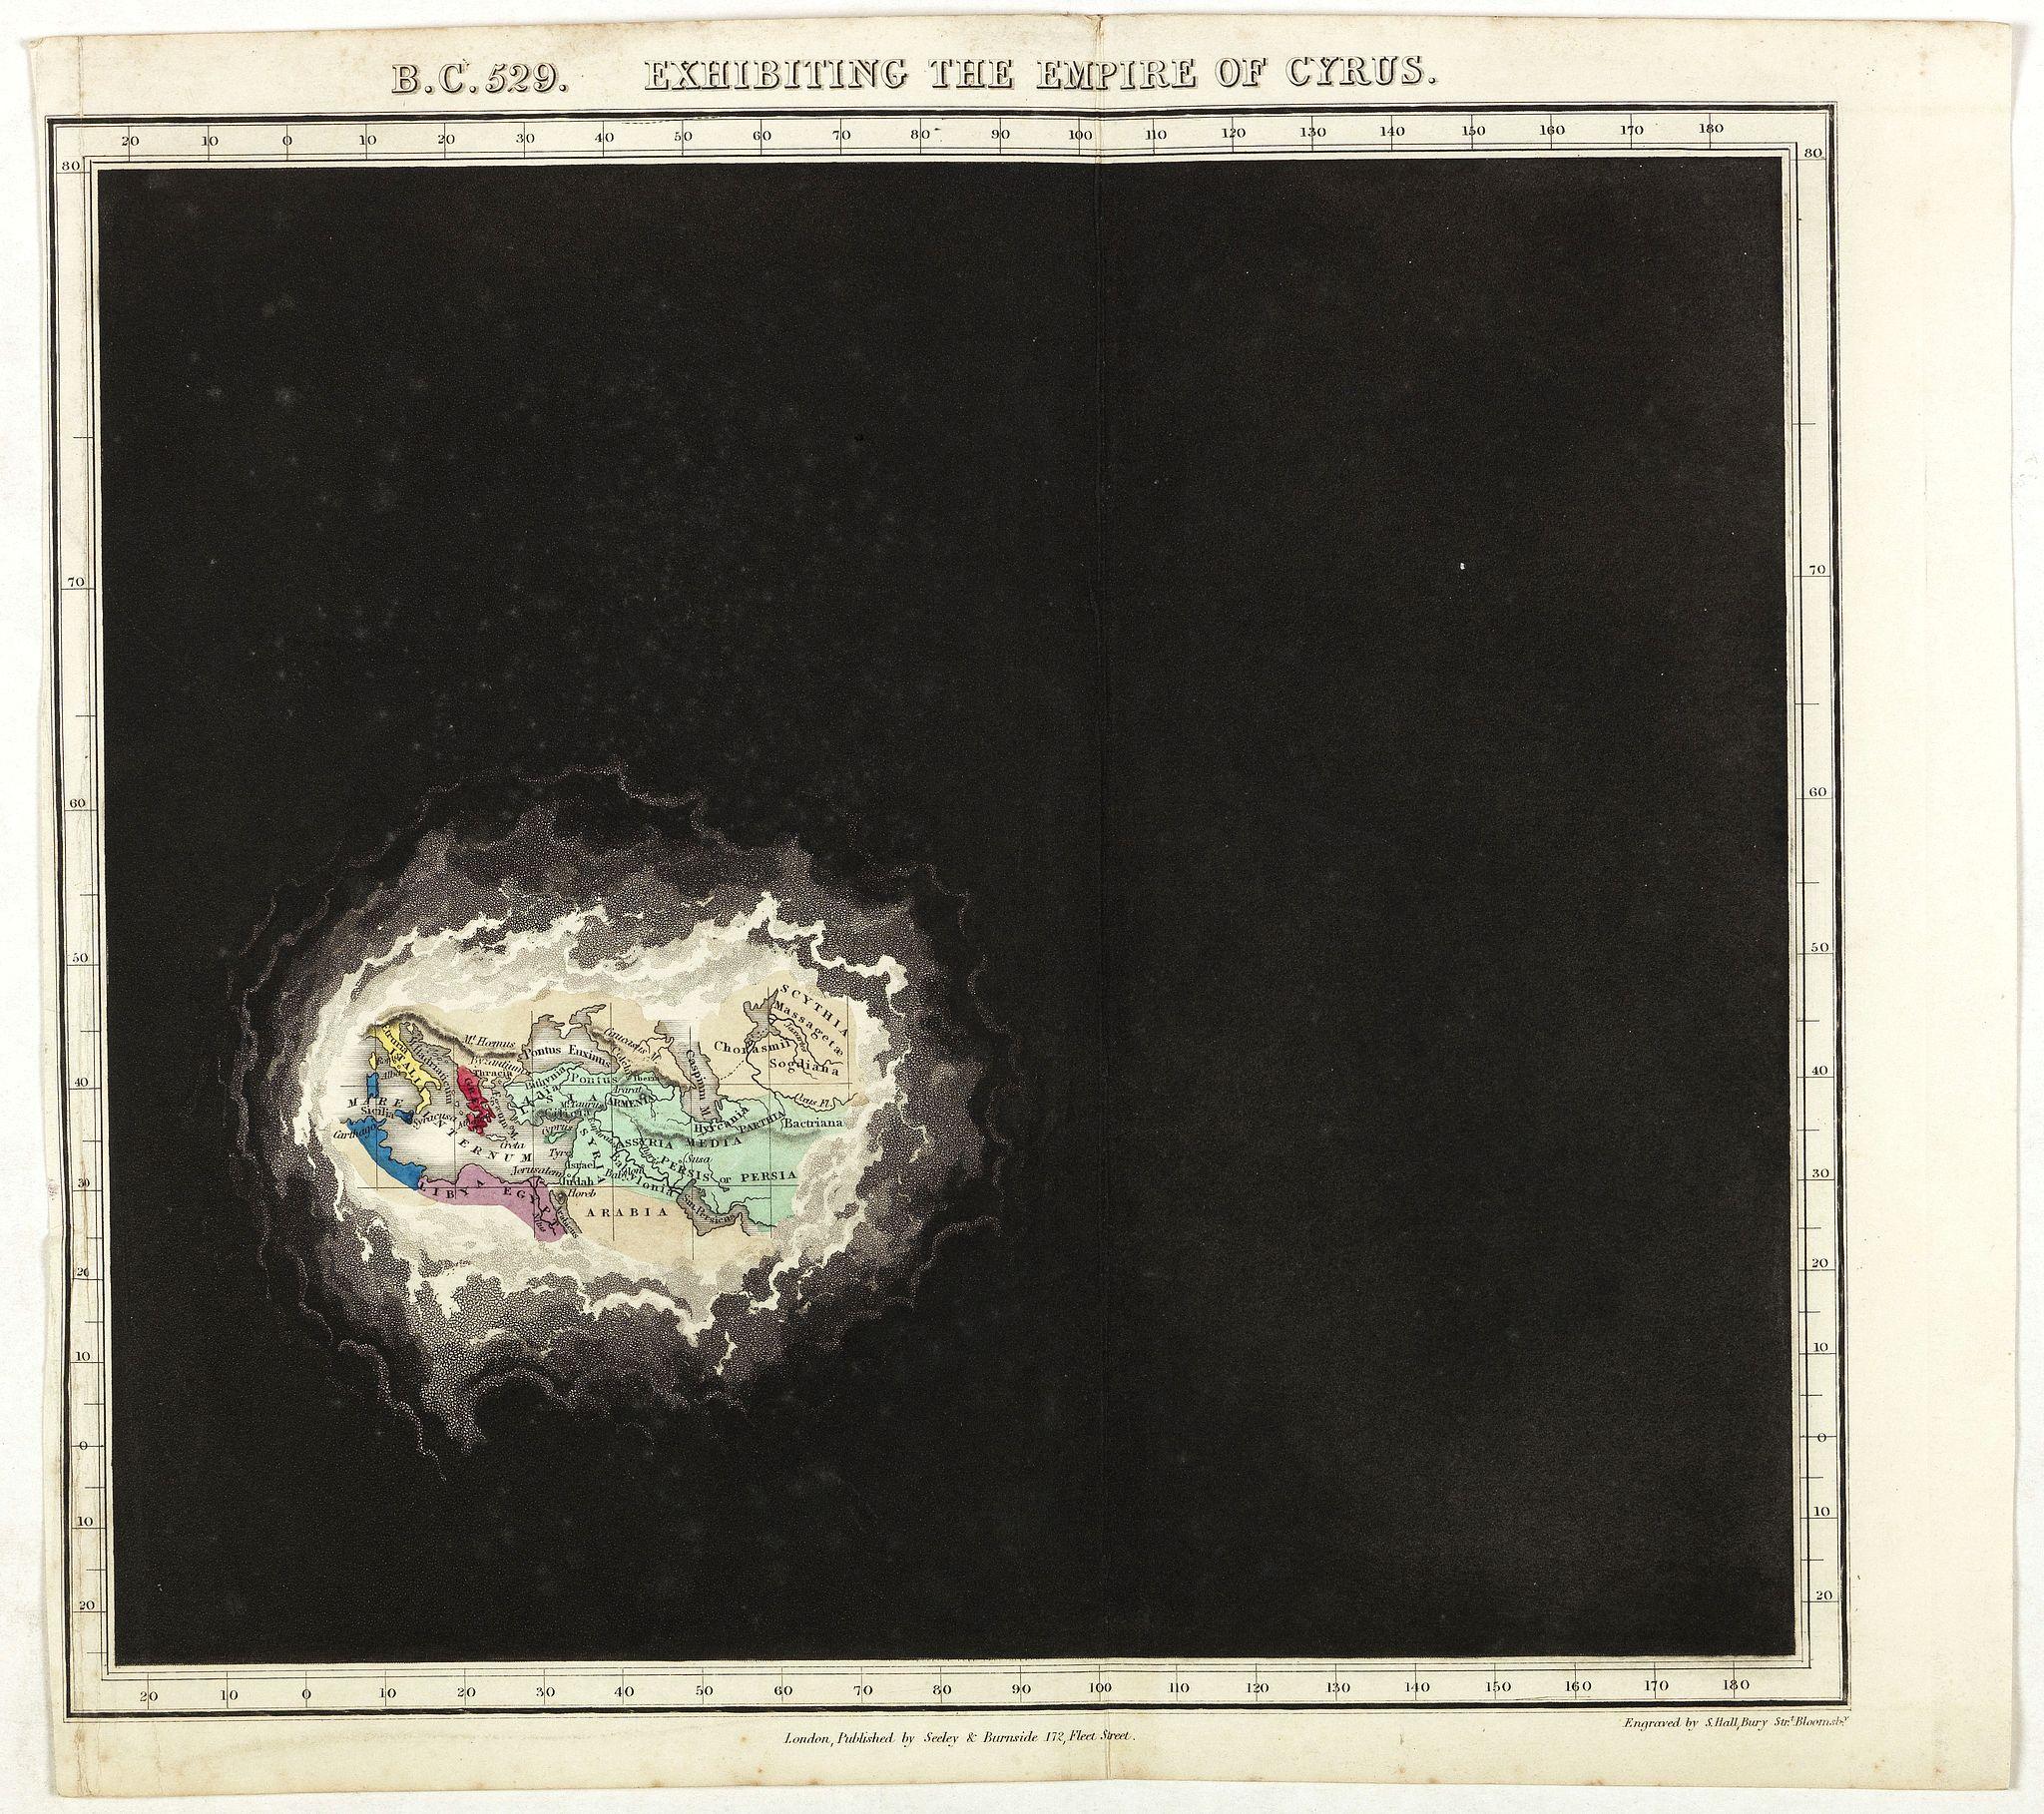 QUIN, E. -  B.C. 529. Exhibiting the Empire of Cyprus.